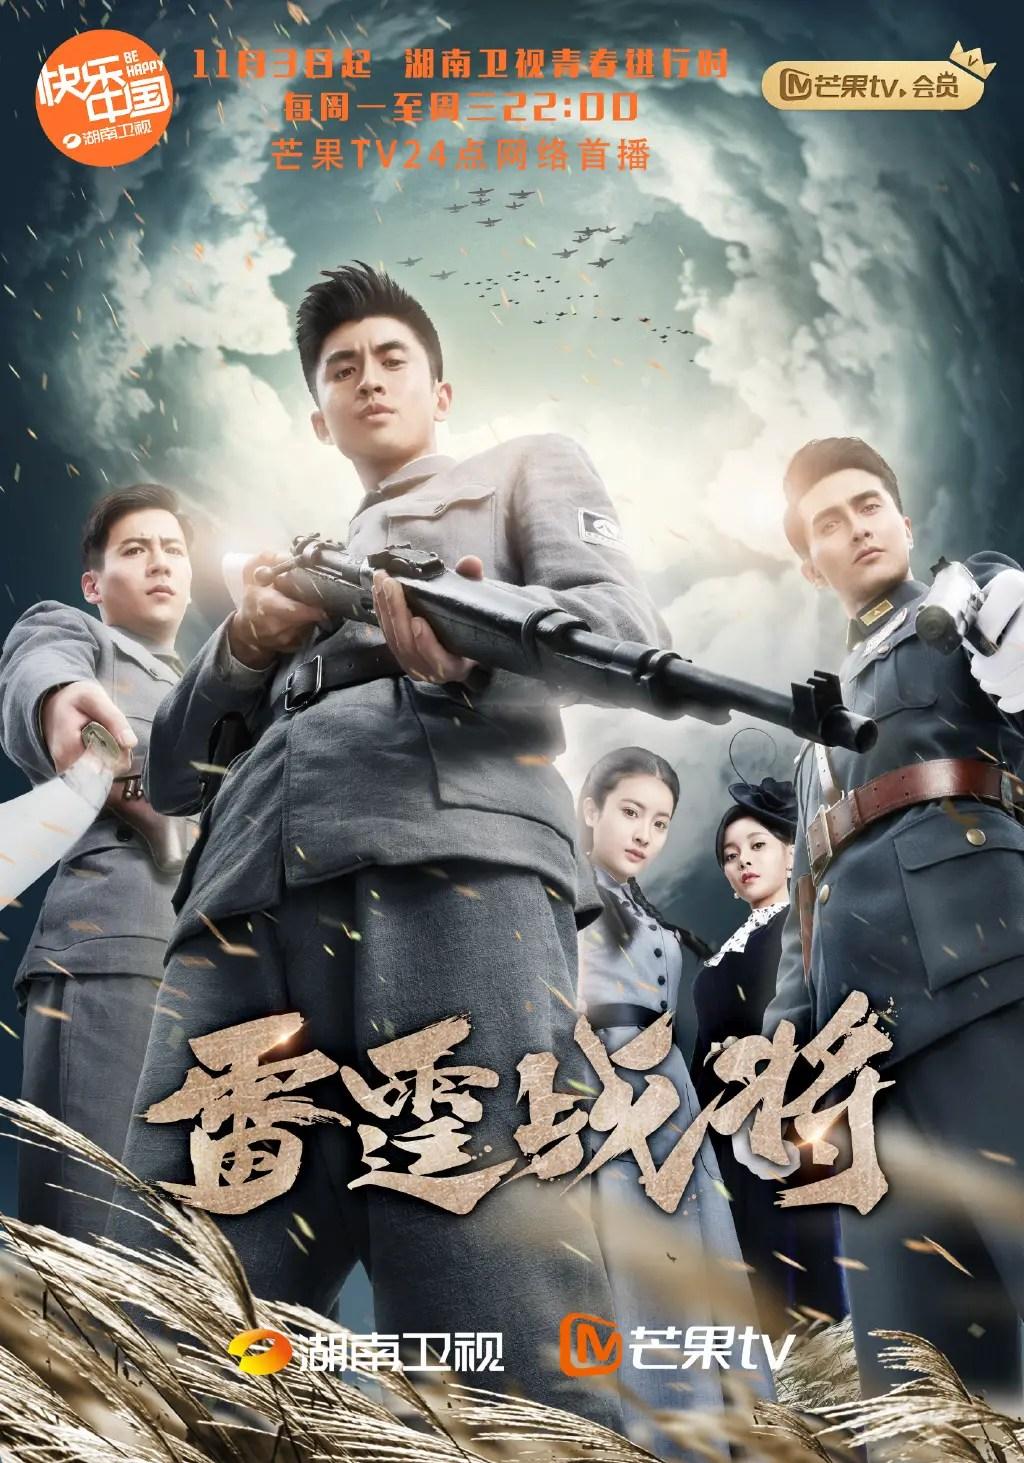 Drawing Sword 3 Chinese Drama Poster